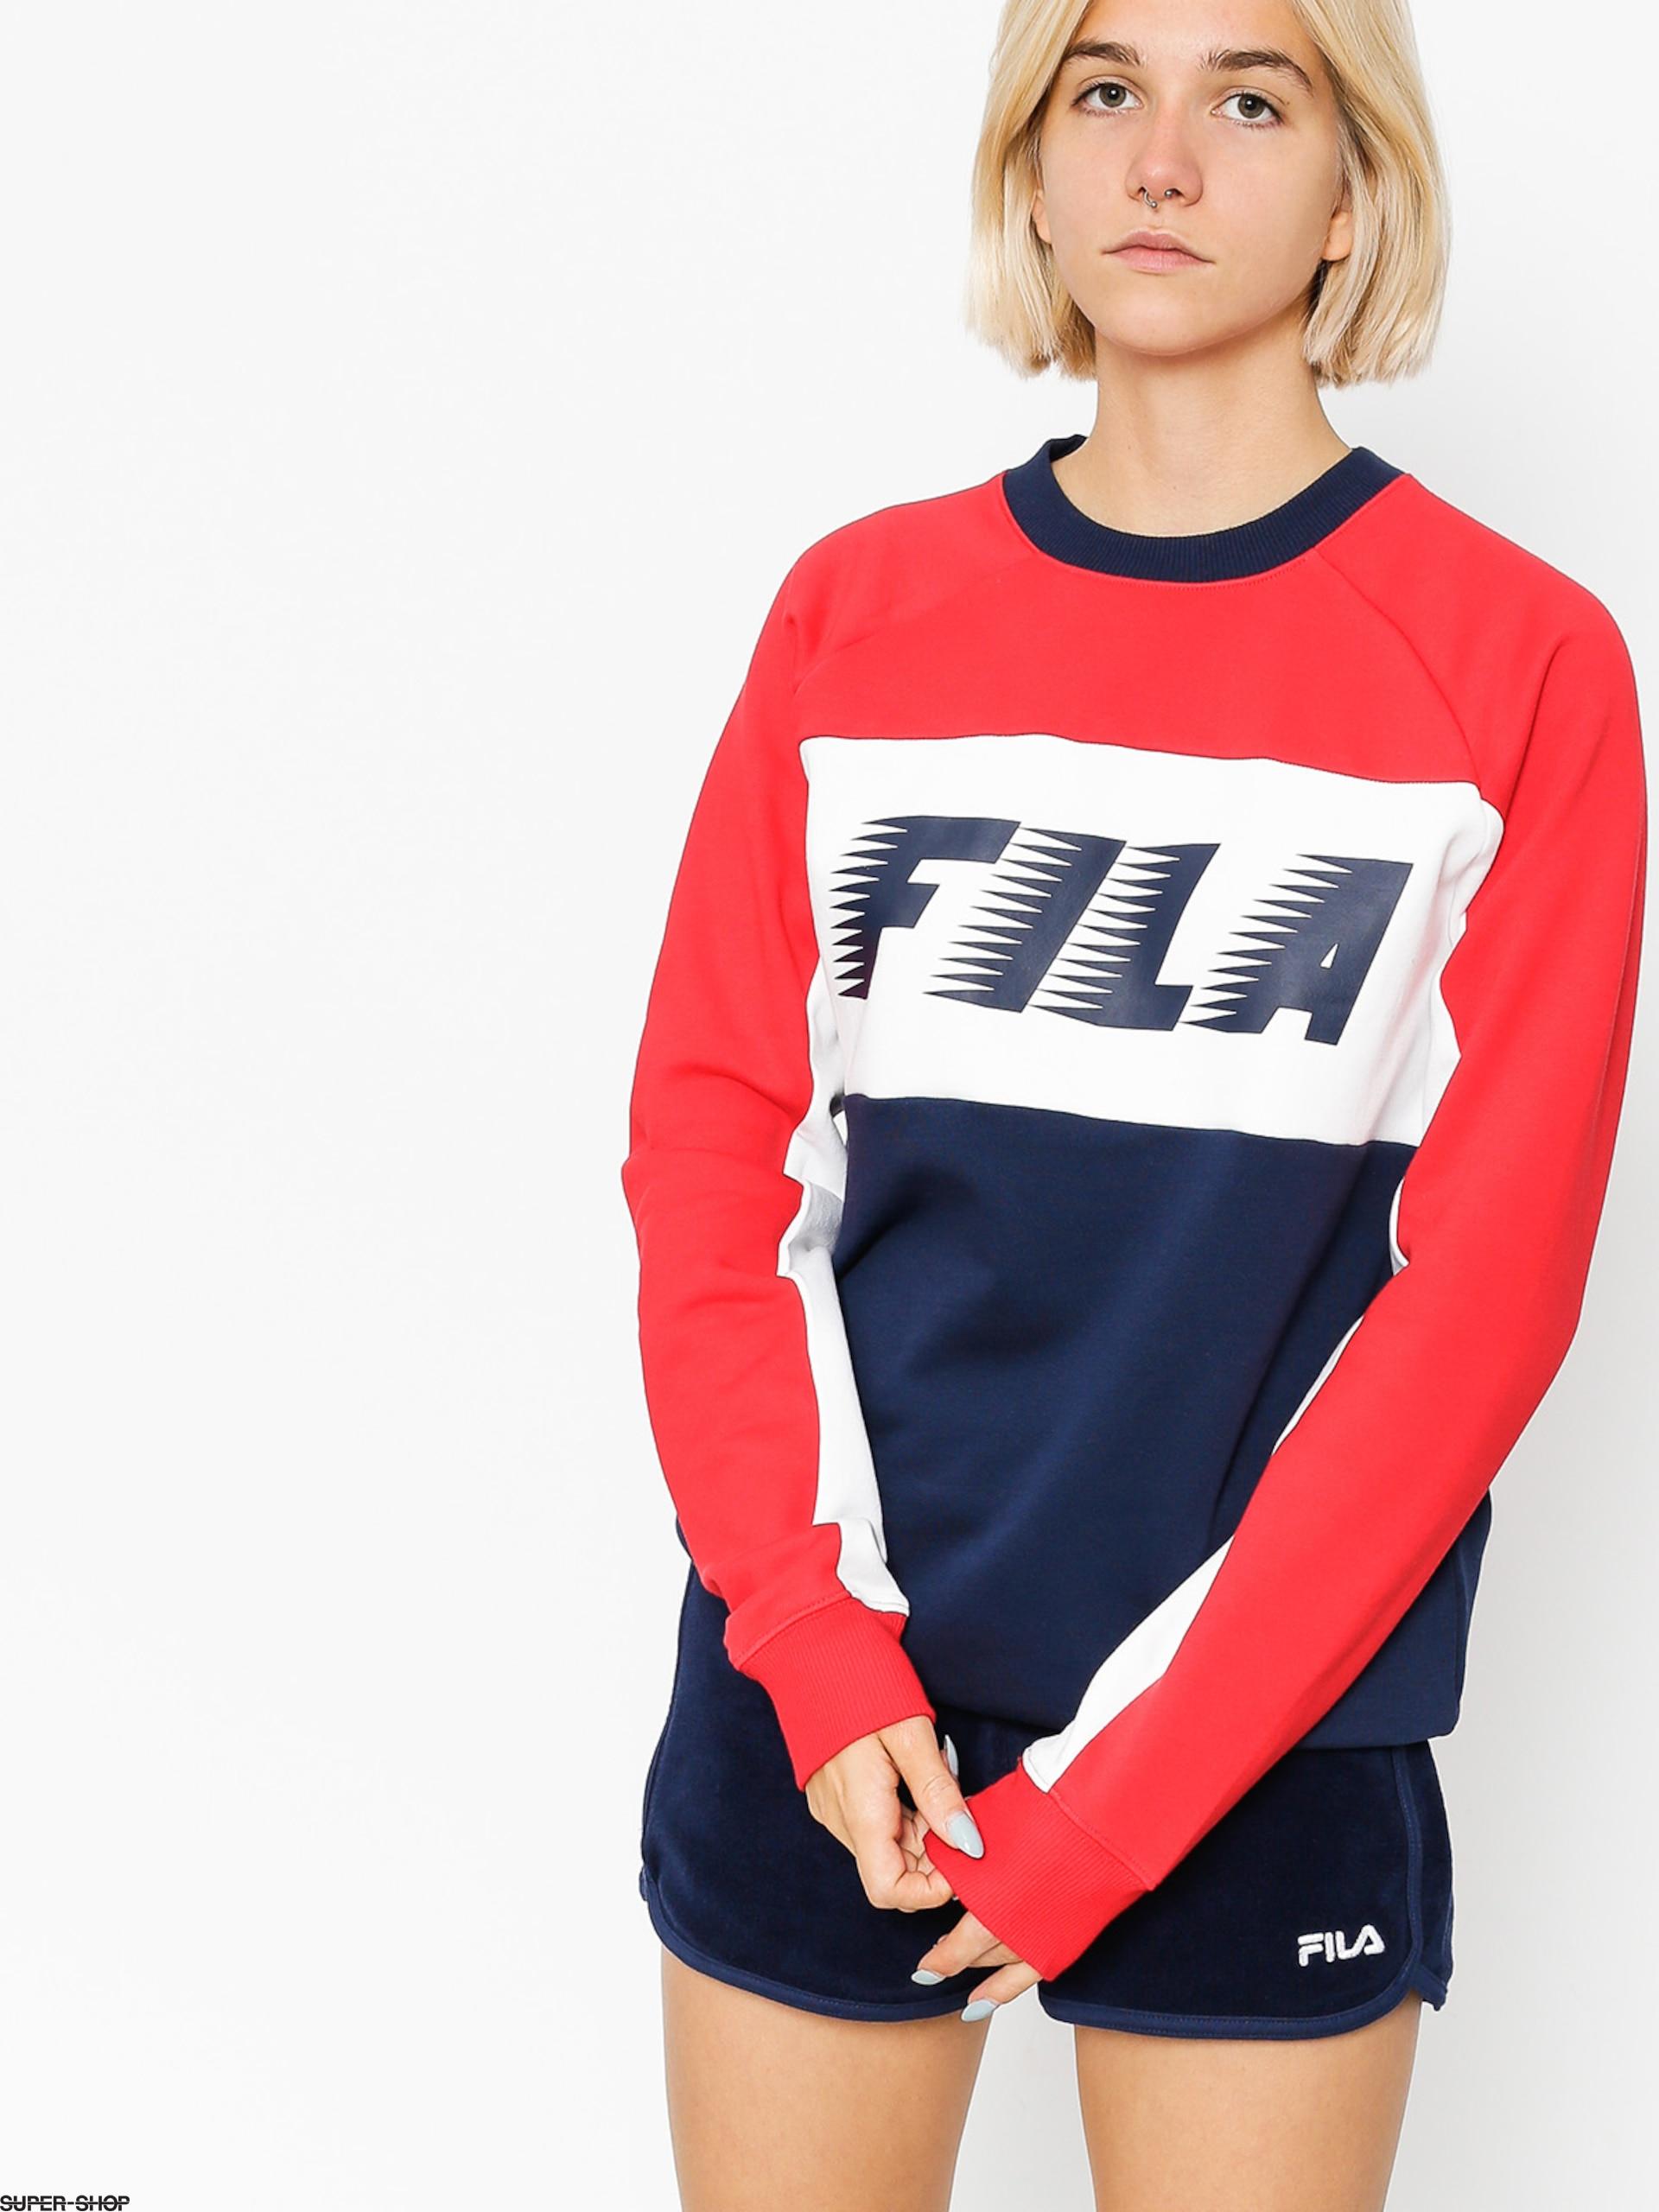 2a6bf35421e 954060-w1920-fila-sweatshirt-layton-colour-block-wmn-peacoat-red-white.jpg